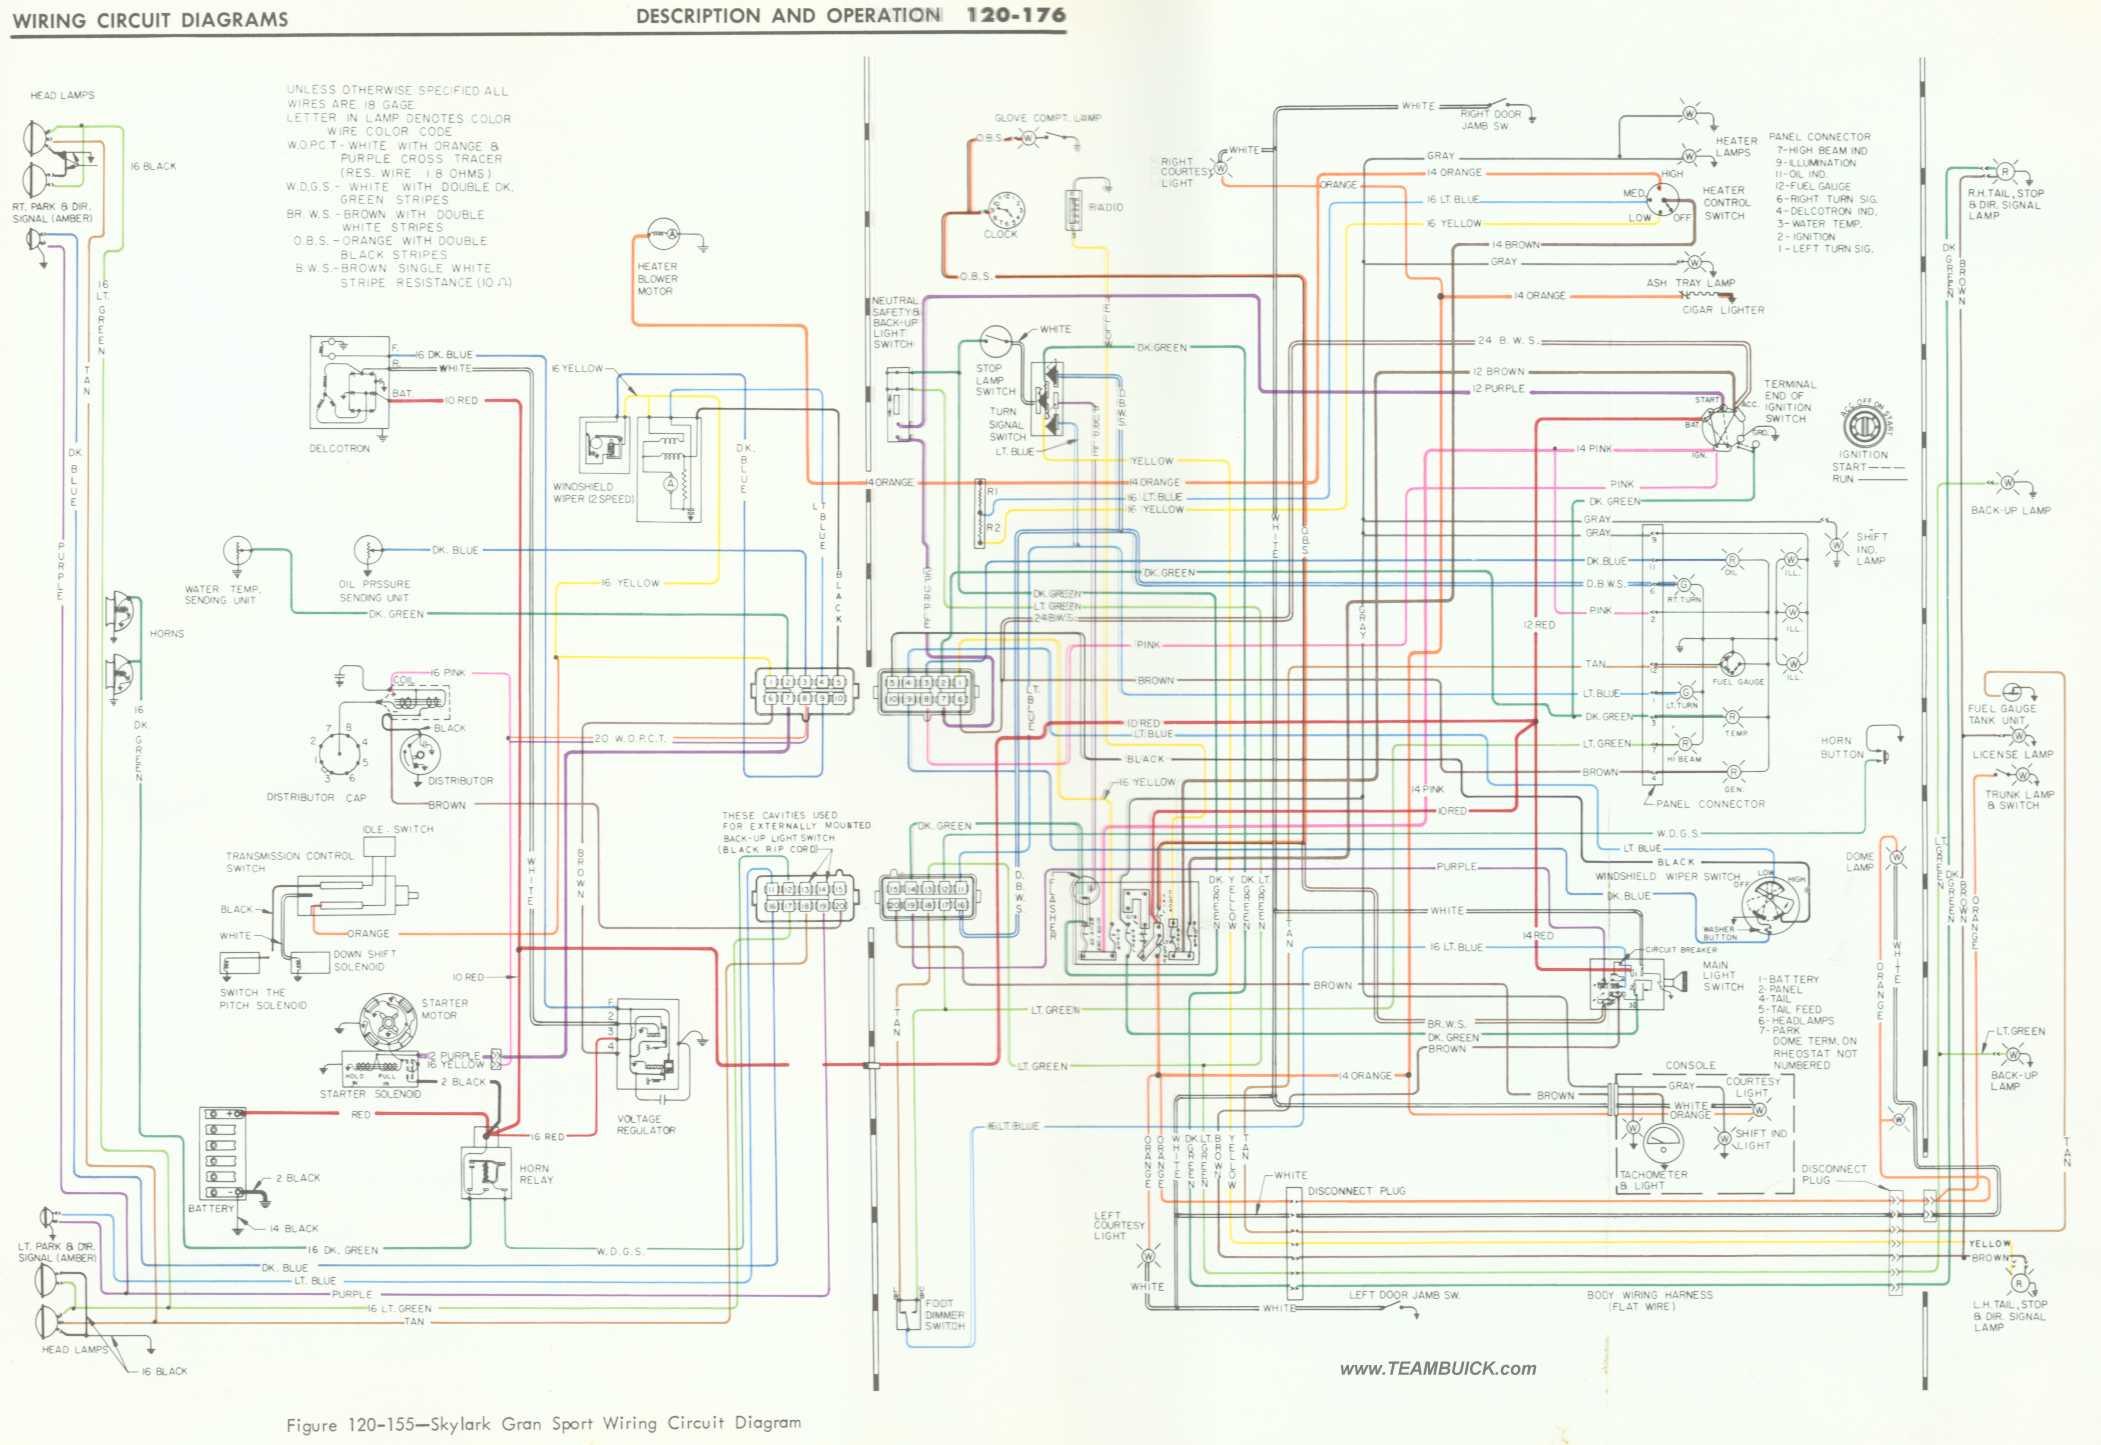 Surprising 1972 Buick Riviera Wiring Diagram Wiring Library Wiring 101 Eumquscobadownsetwise Assnl